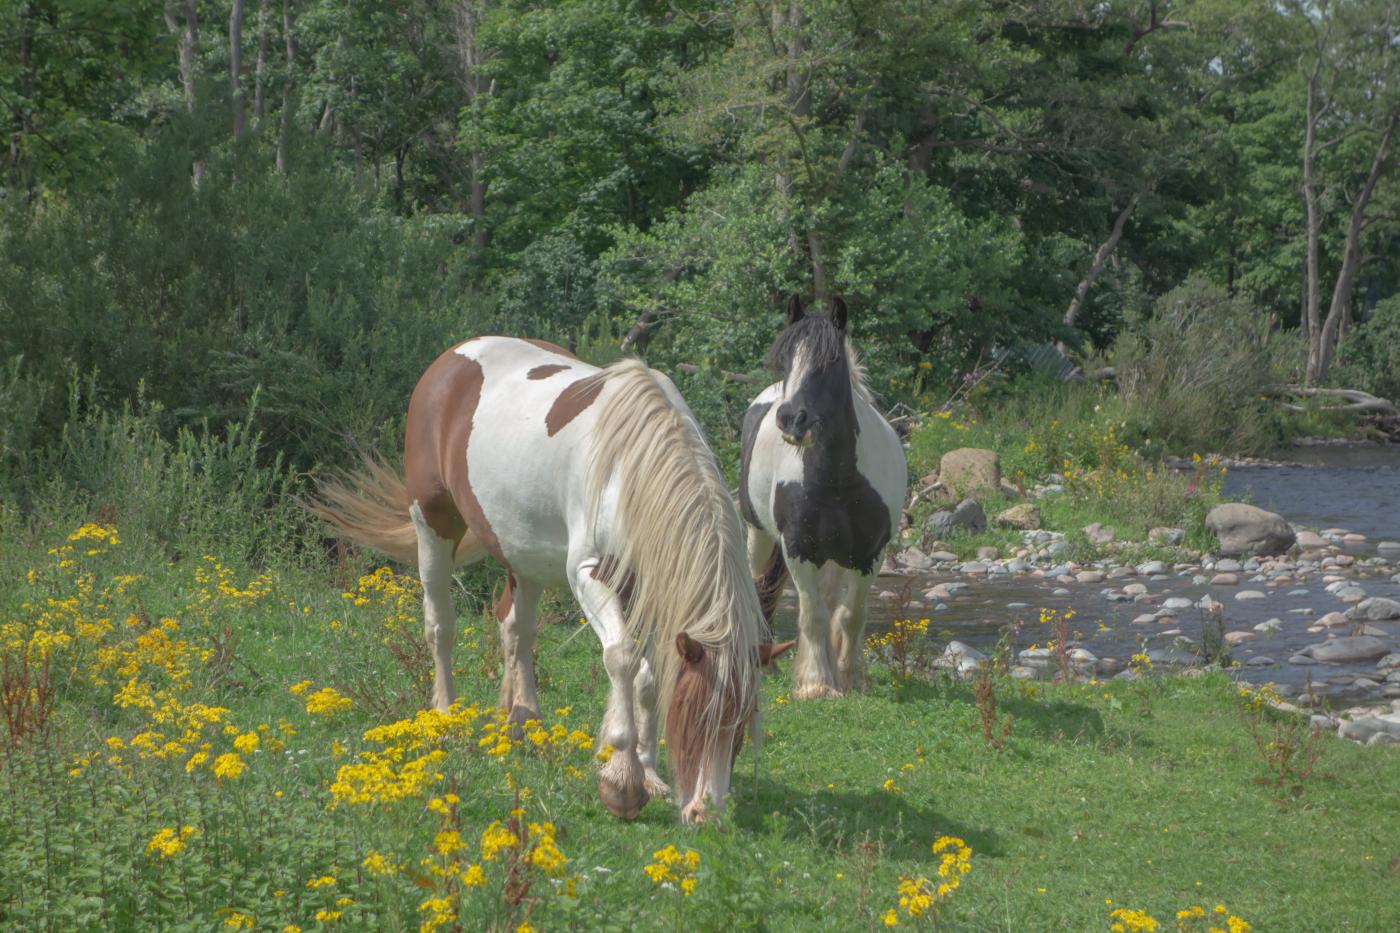 Brace of horses_Tim Parmley